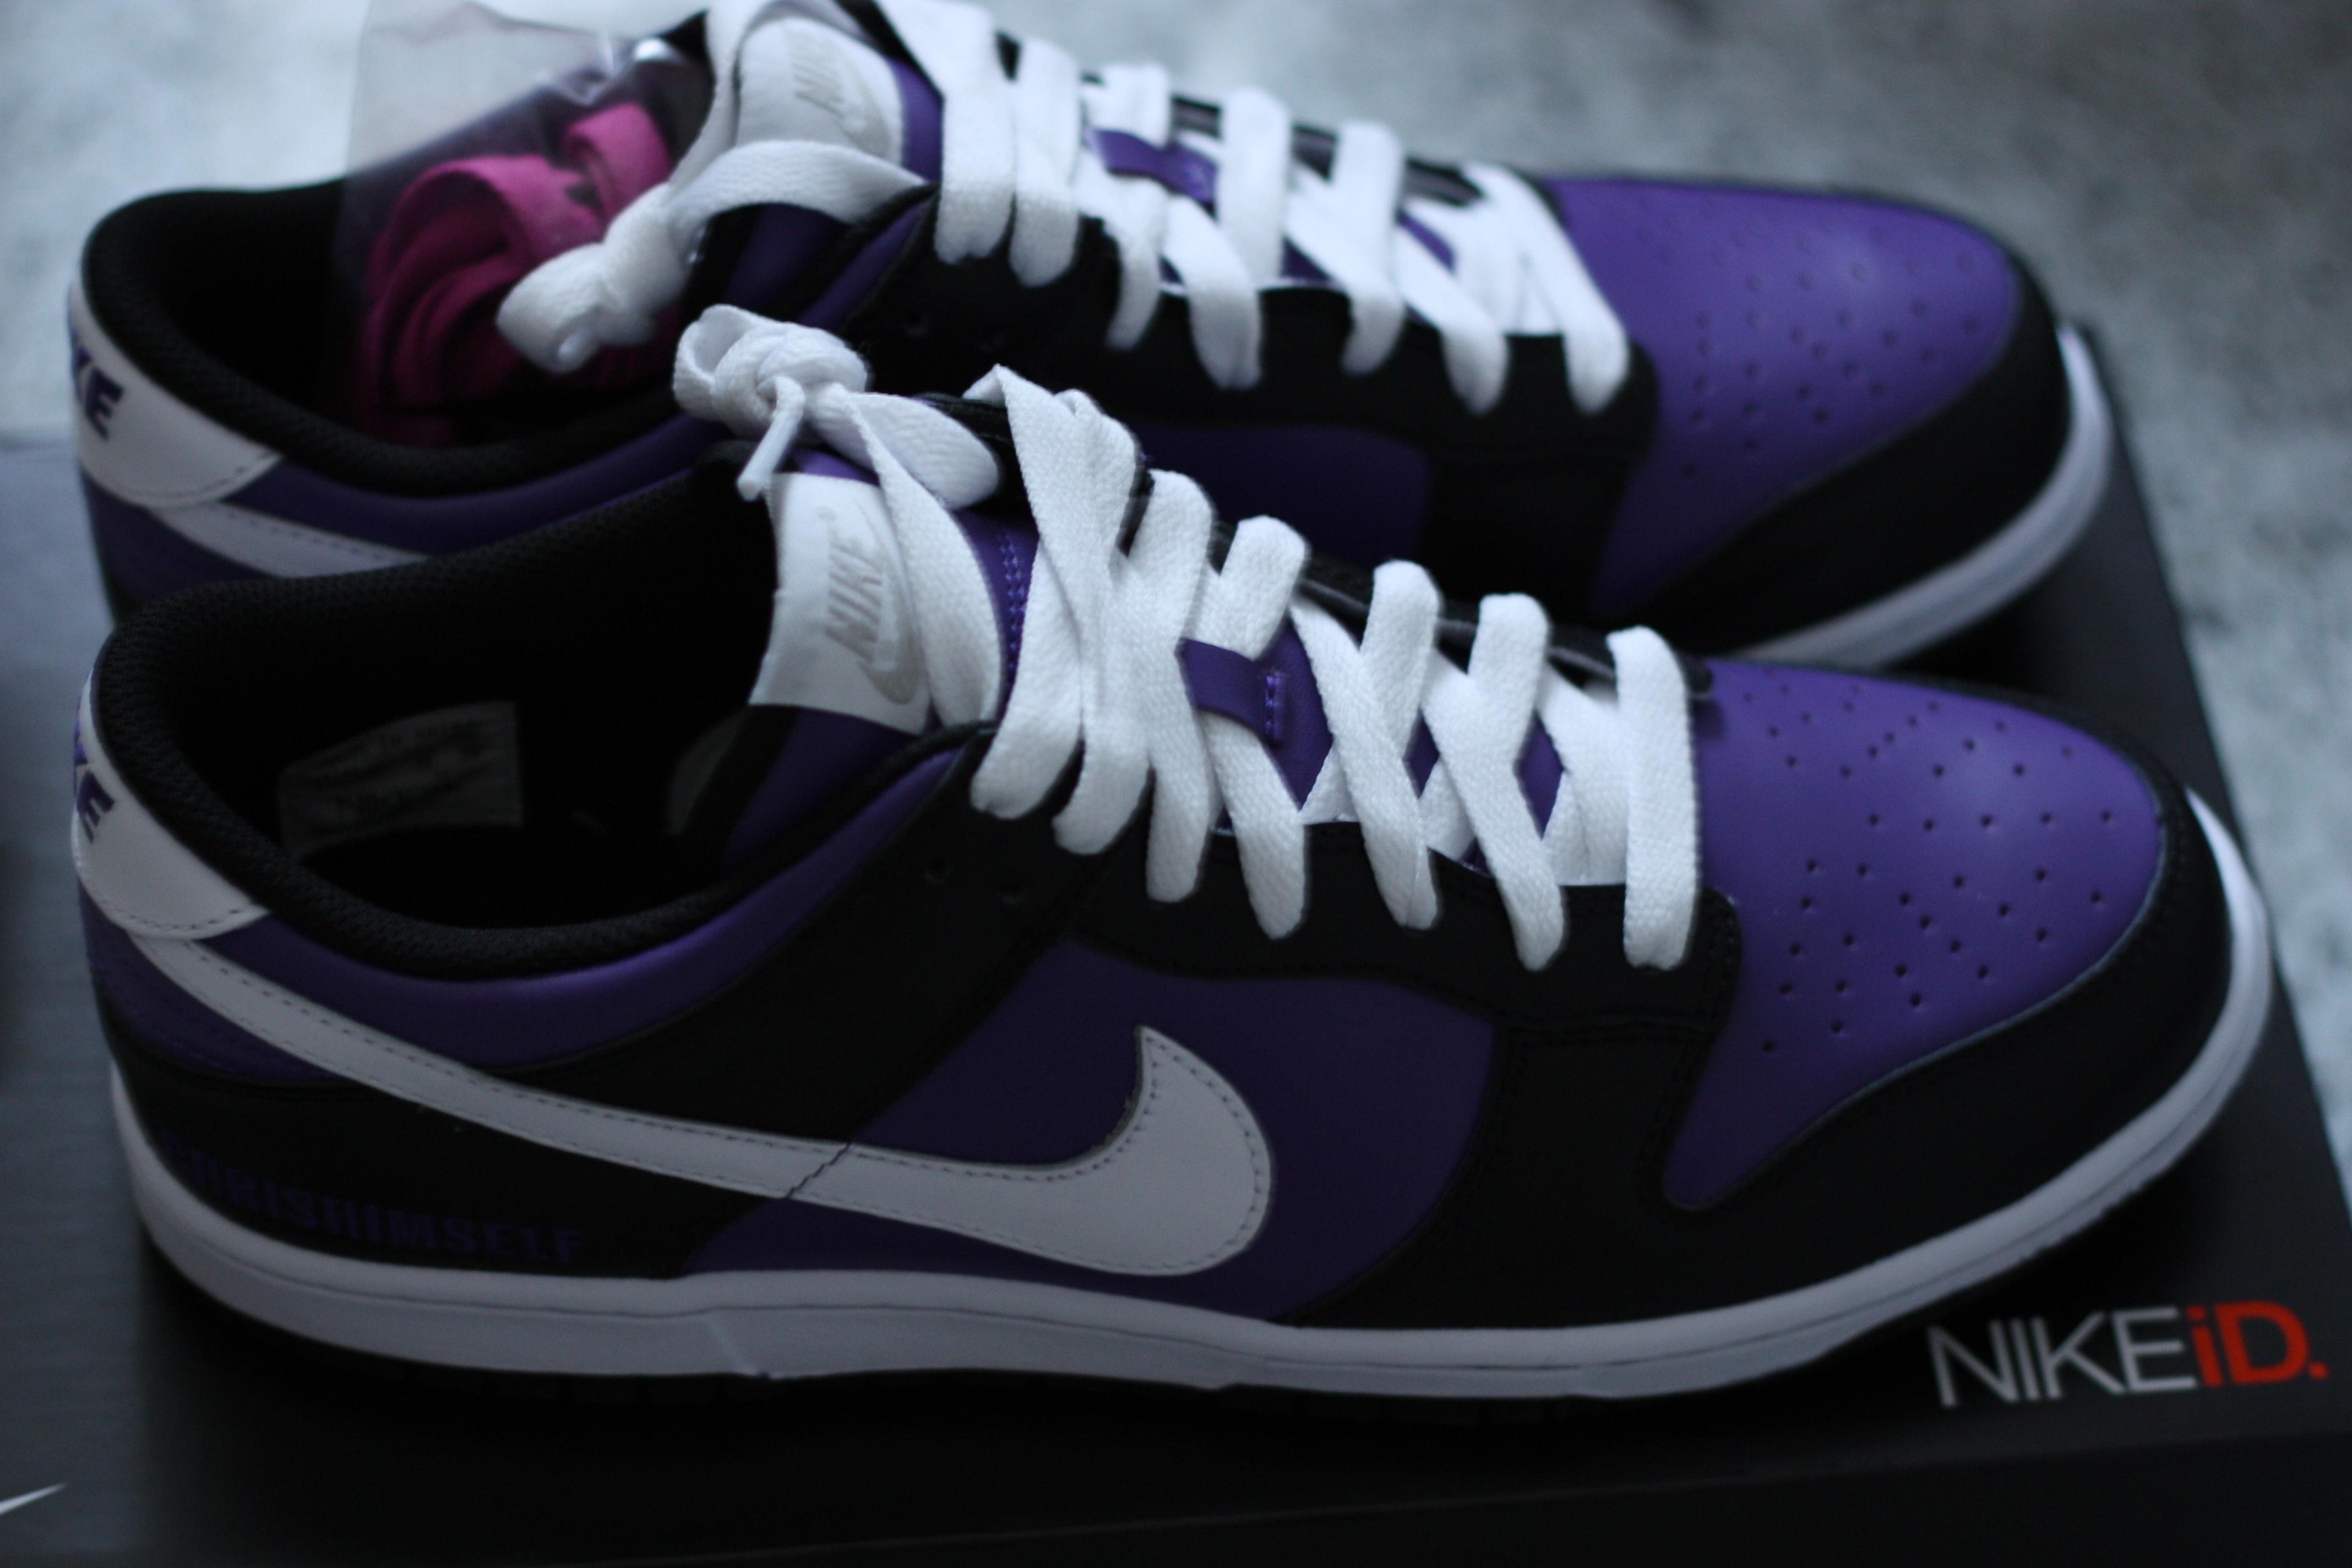 NikeID customized shoe